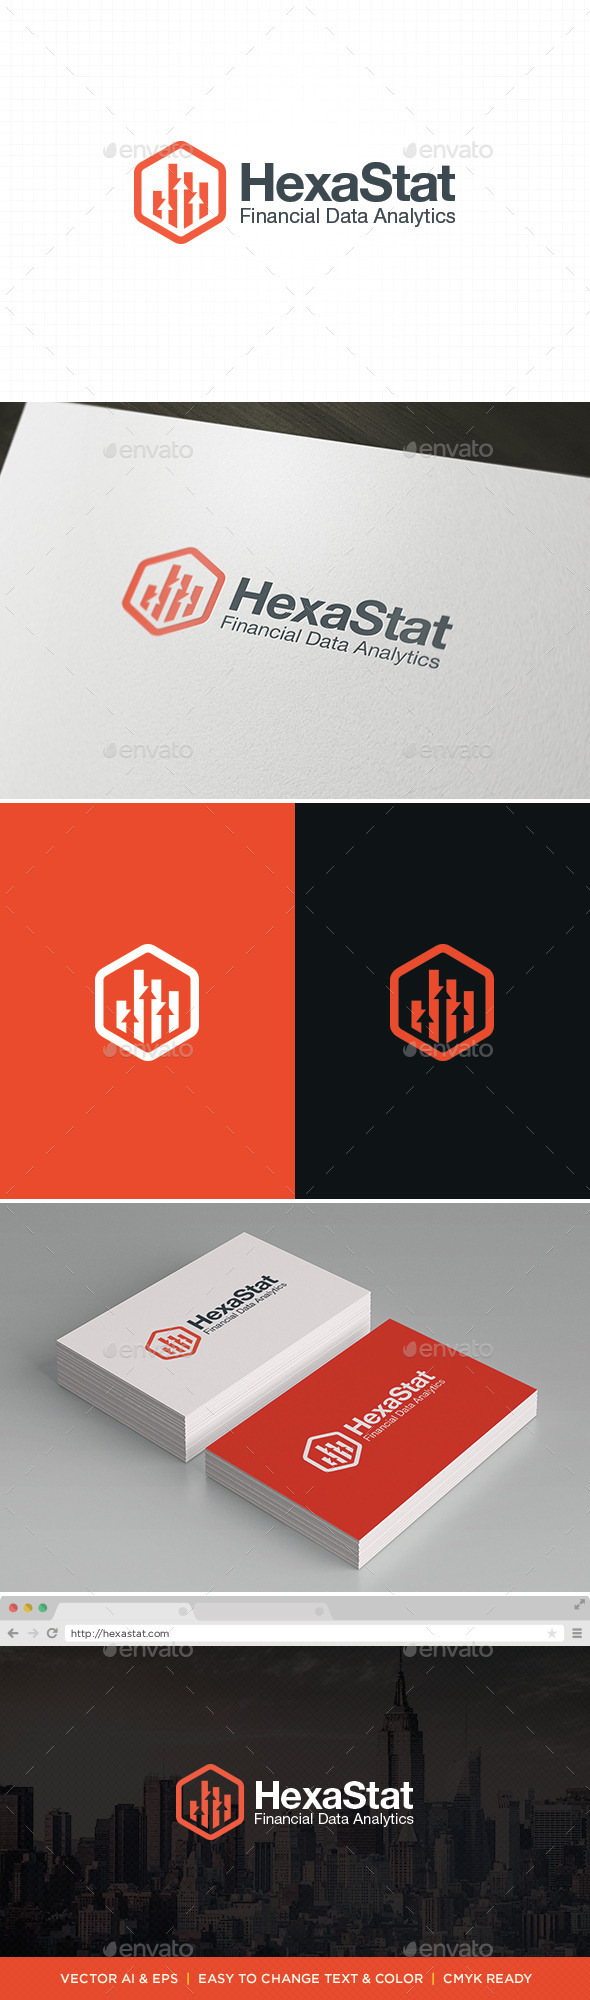 GraphicRiver HexaStat Logo 11422471